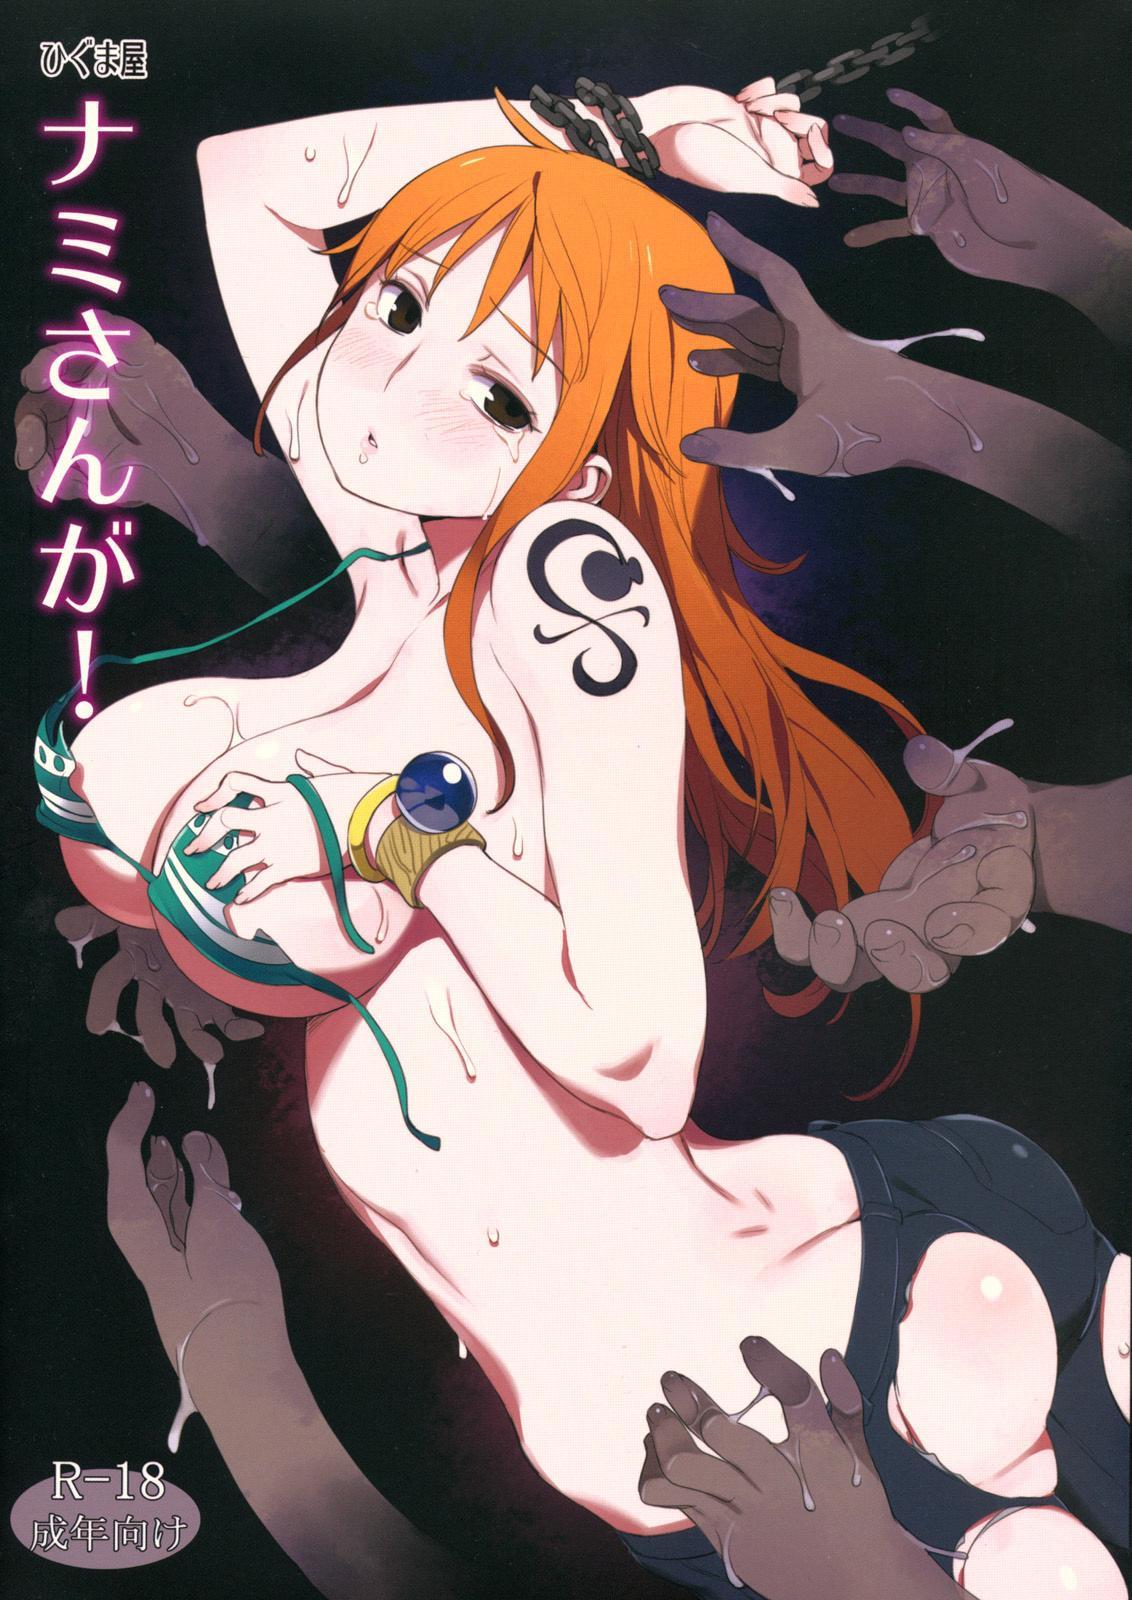 (C81) [Higuma-ya (Nora Higuma)] Nami-san ga! | Nami-san is! (One Piece) [English] {doujin-moe.us} 0